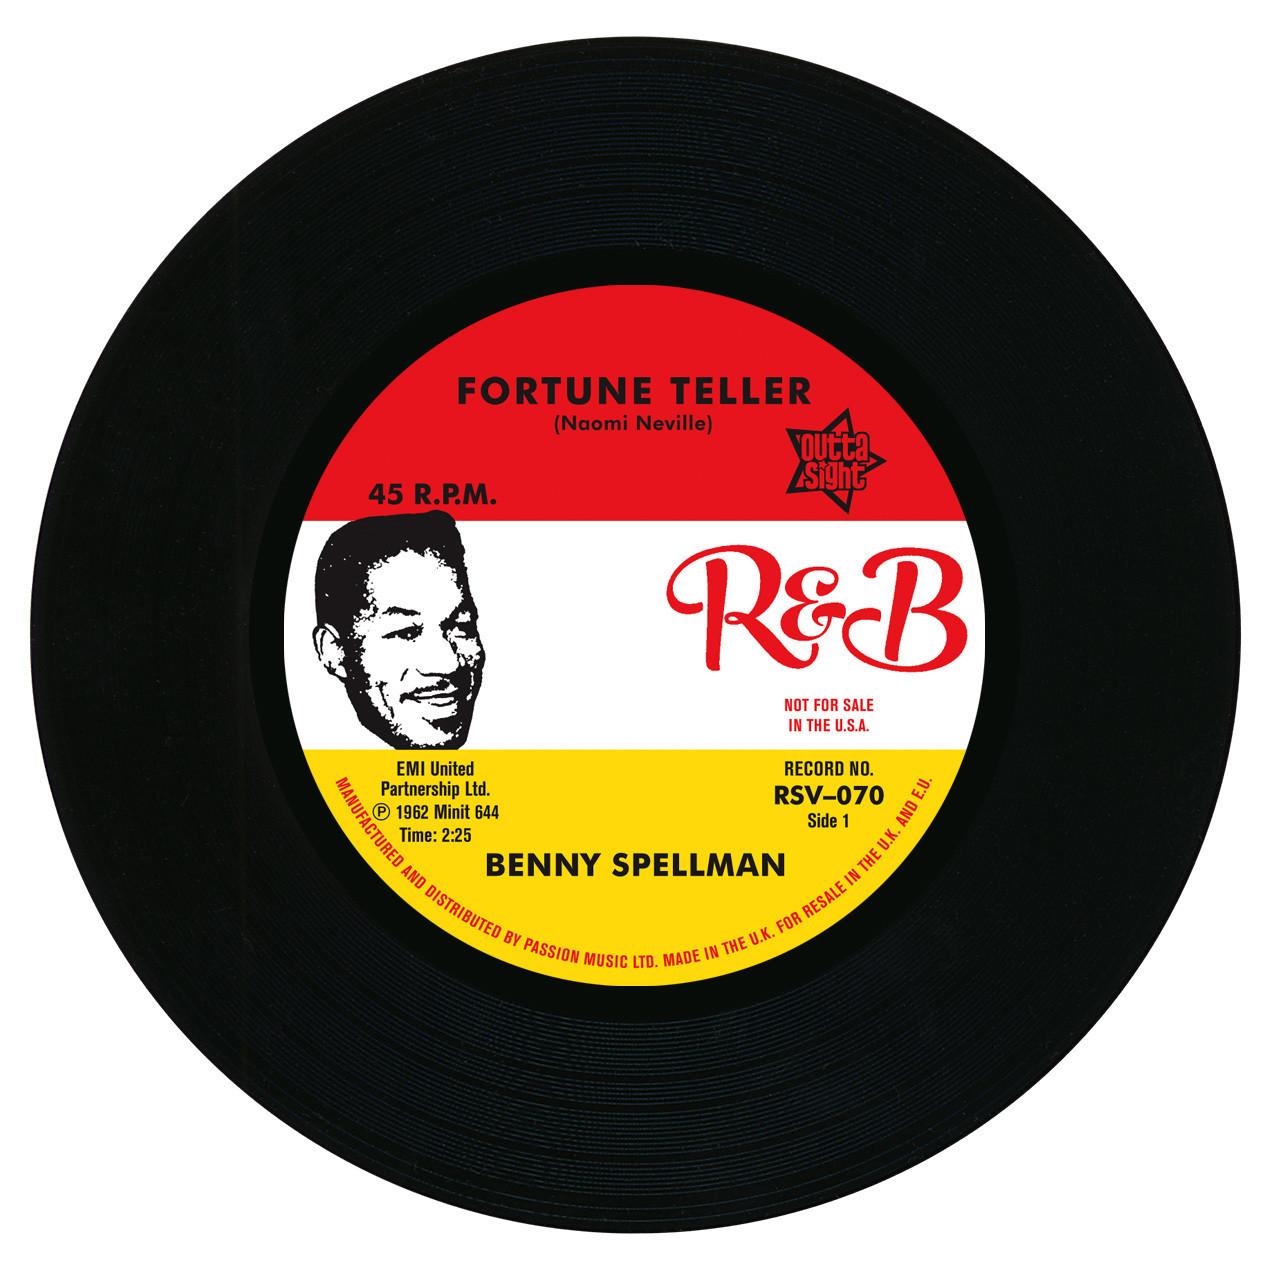 Benny Spellman / Ernie K-Doe